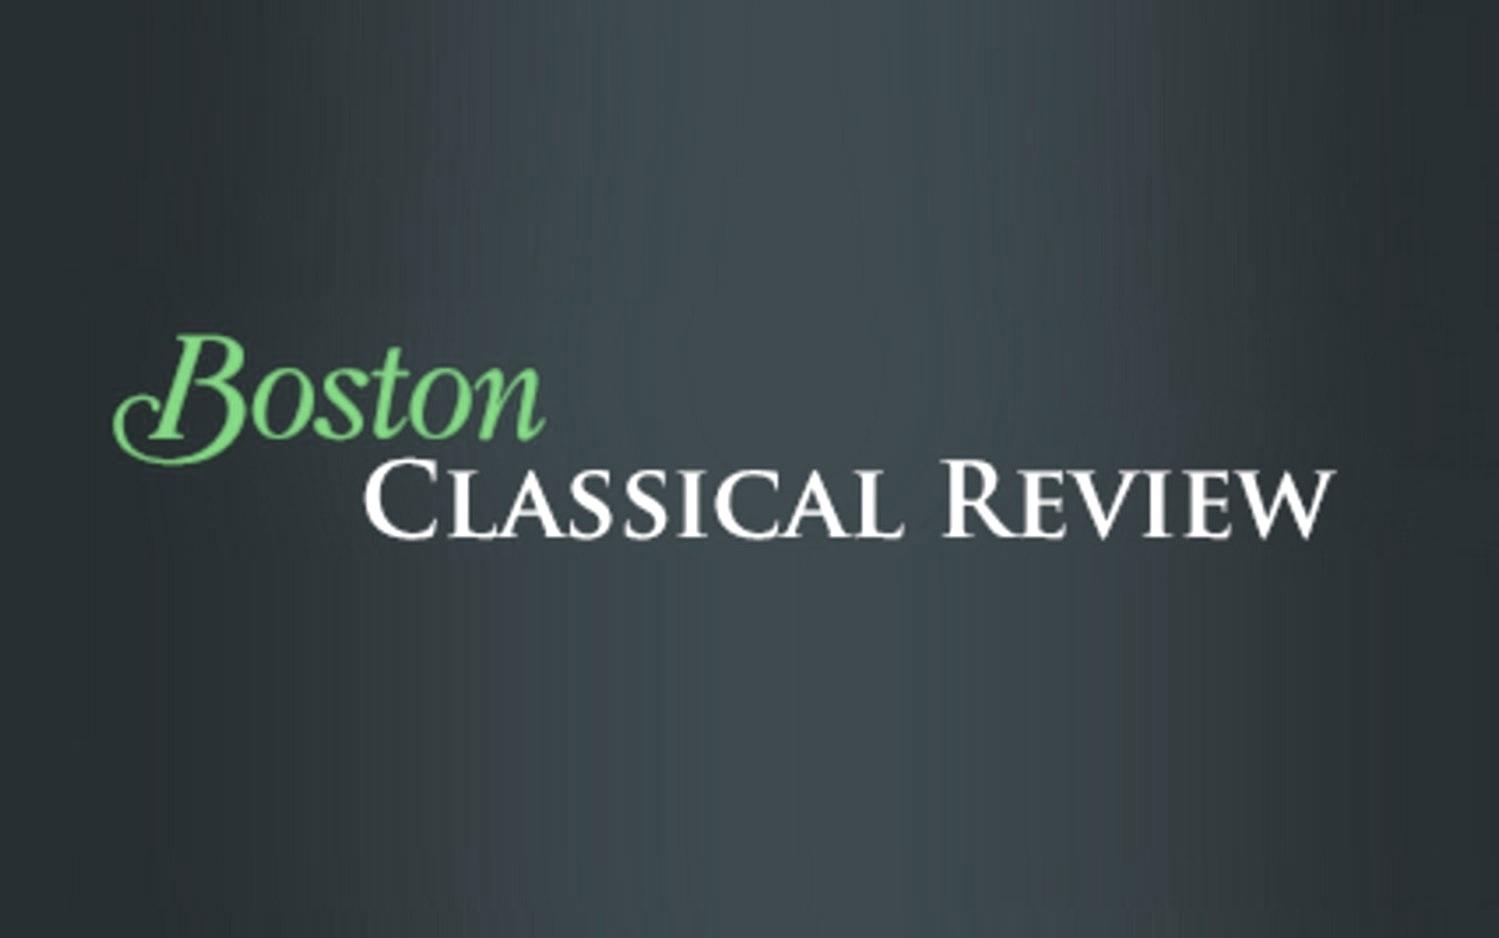 Boston%2BClassical%2BReview%2Blogo.jpg